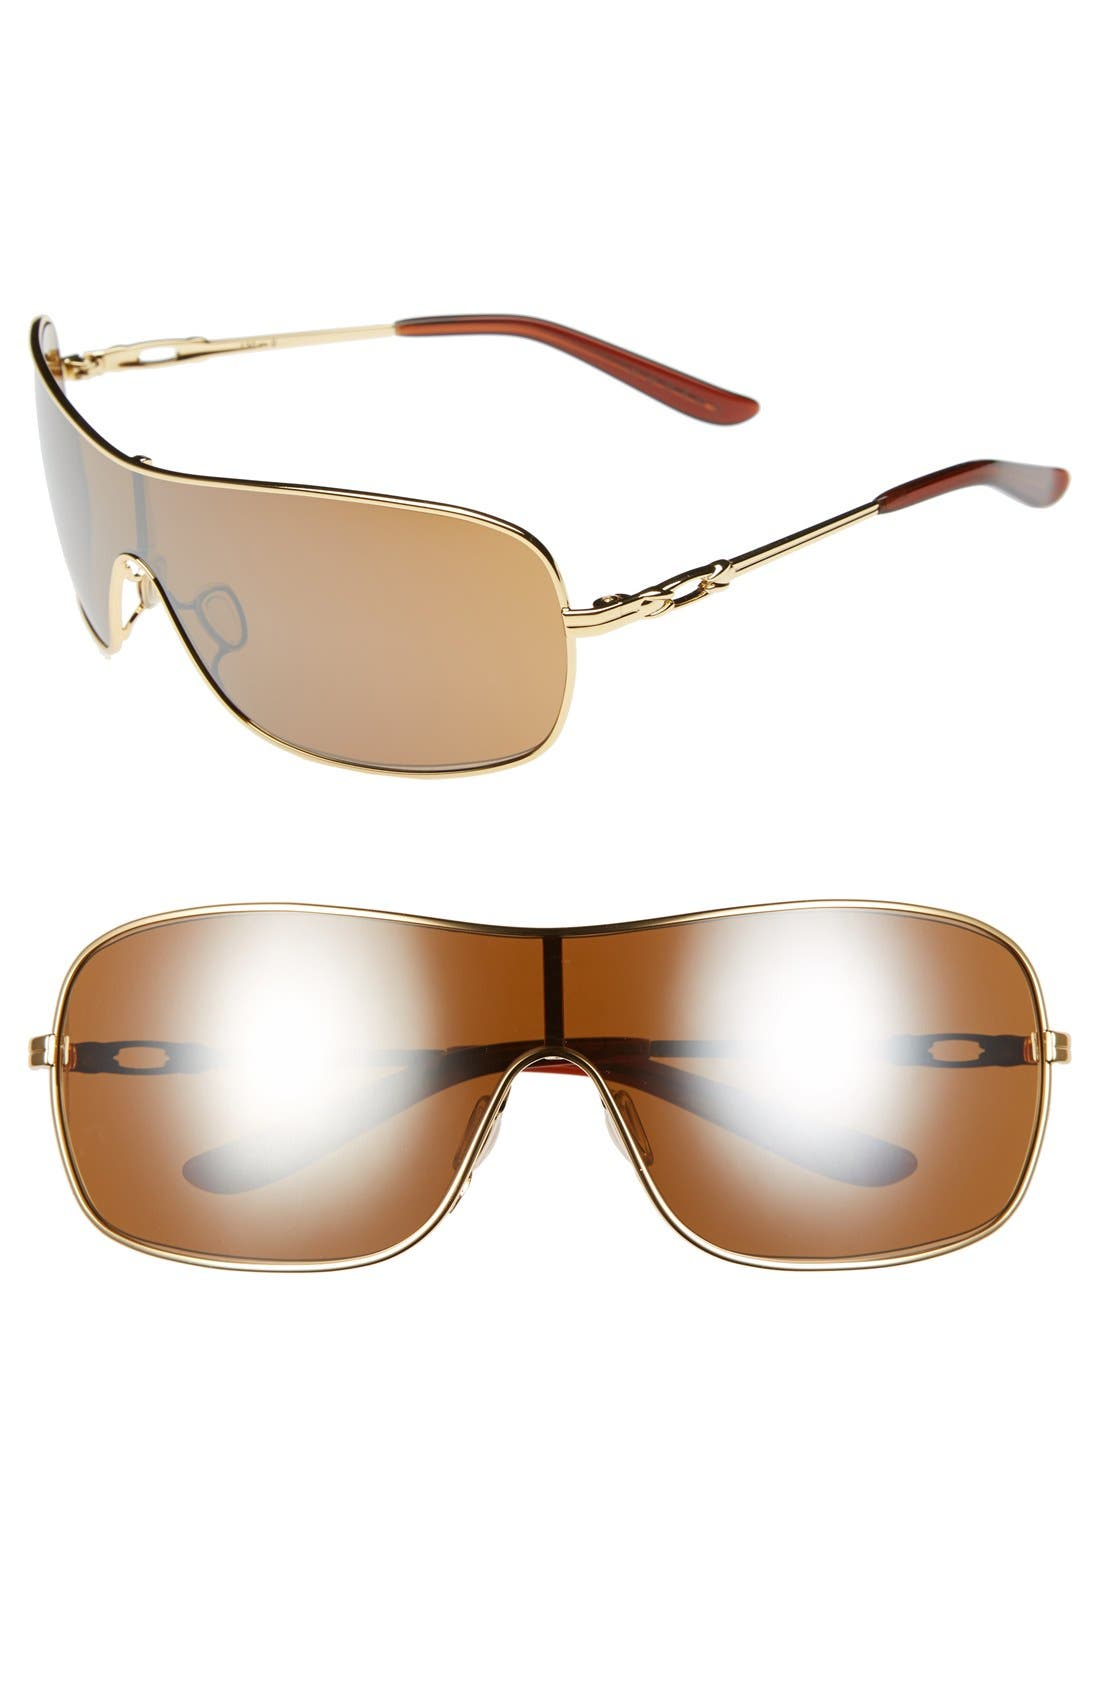 Main Image - Oakley 'Distress' 150mm Polarized Shield Sunglasses